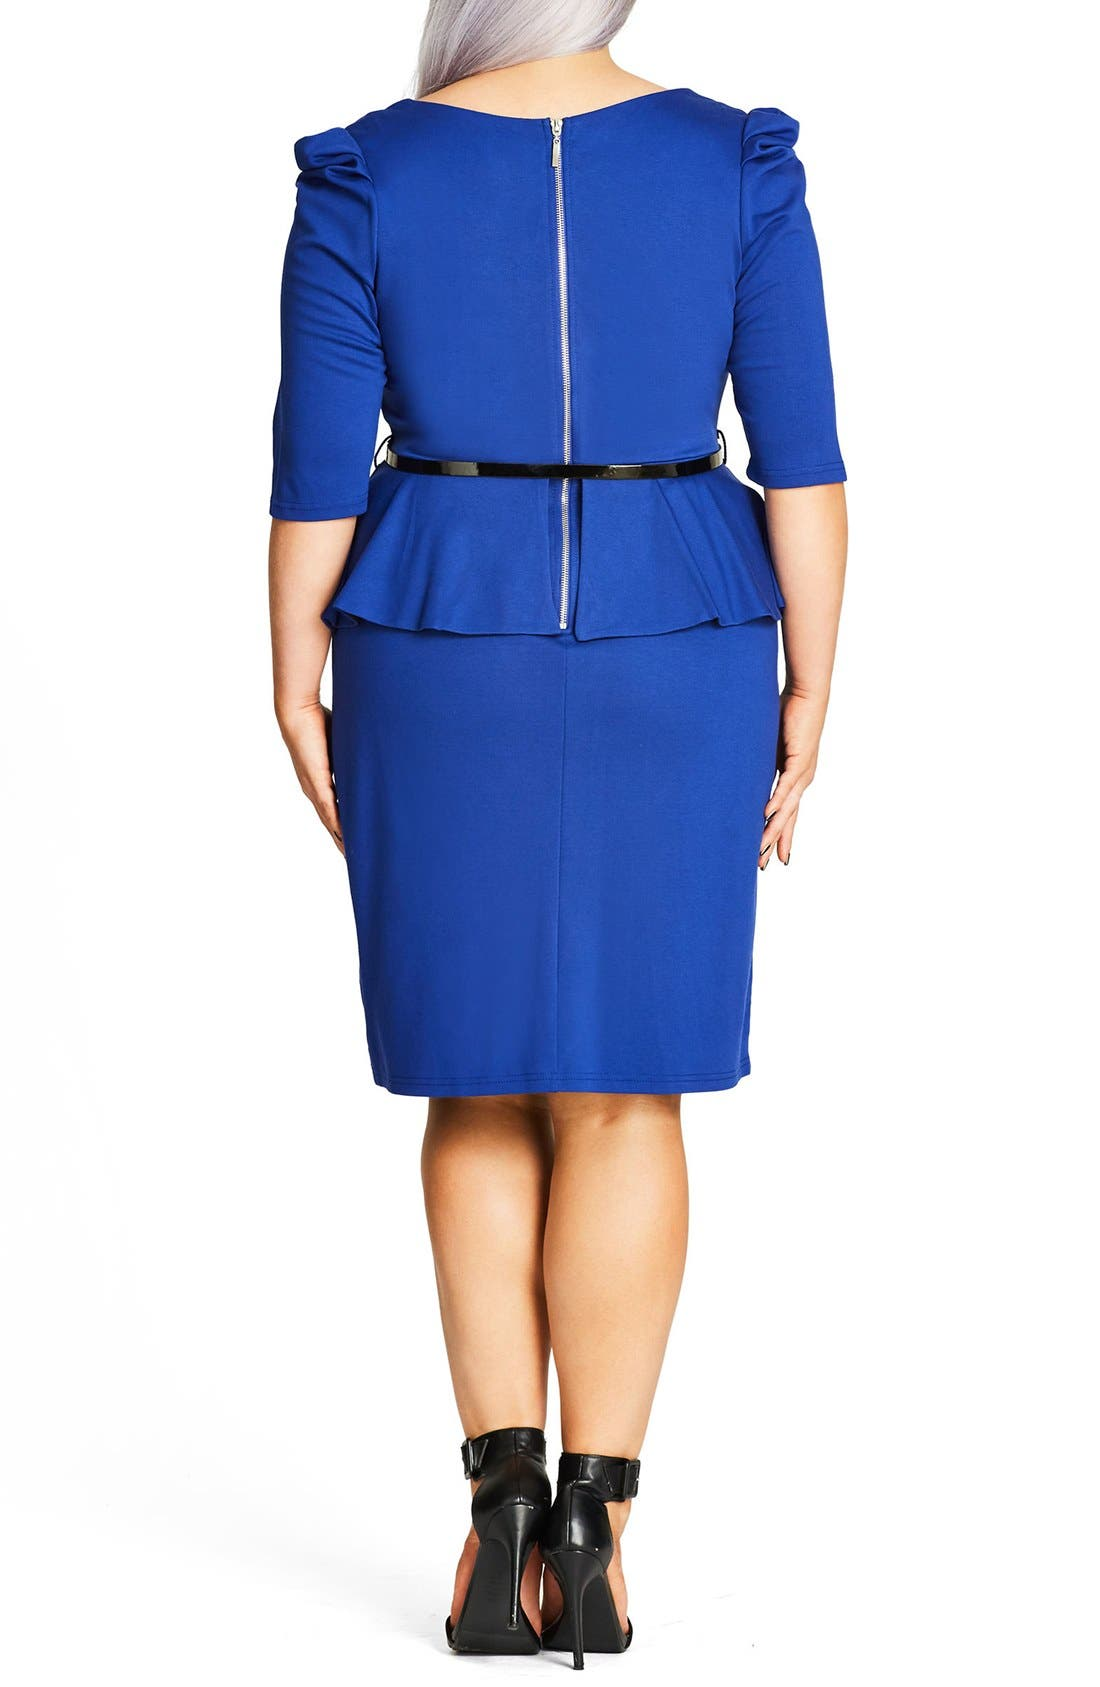 Alternate Image 2  - City Chic Peplum Dress (Plus Size)